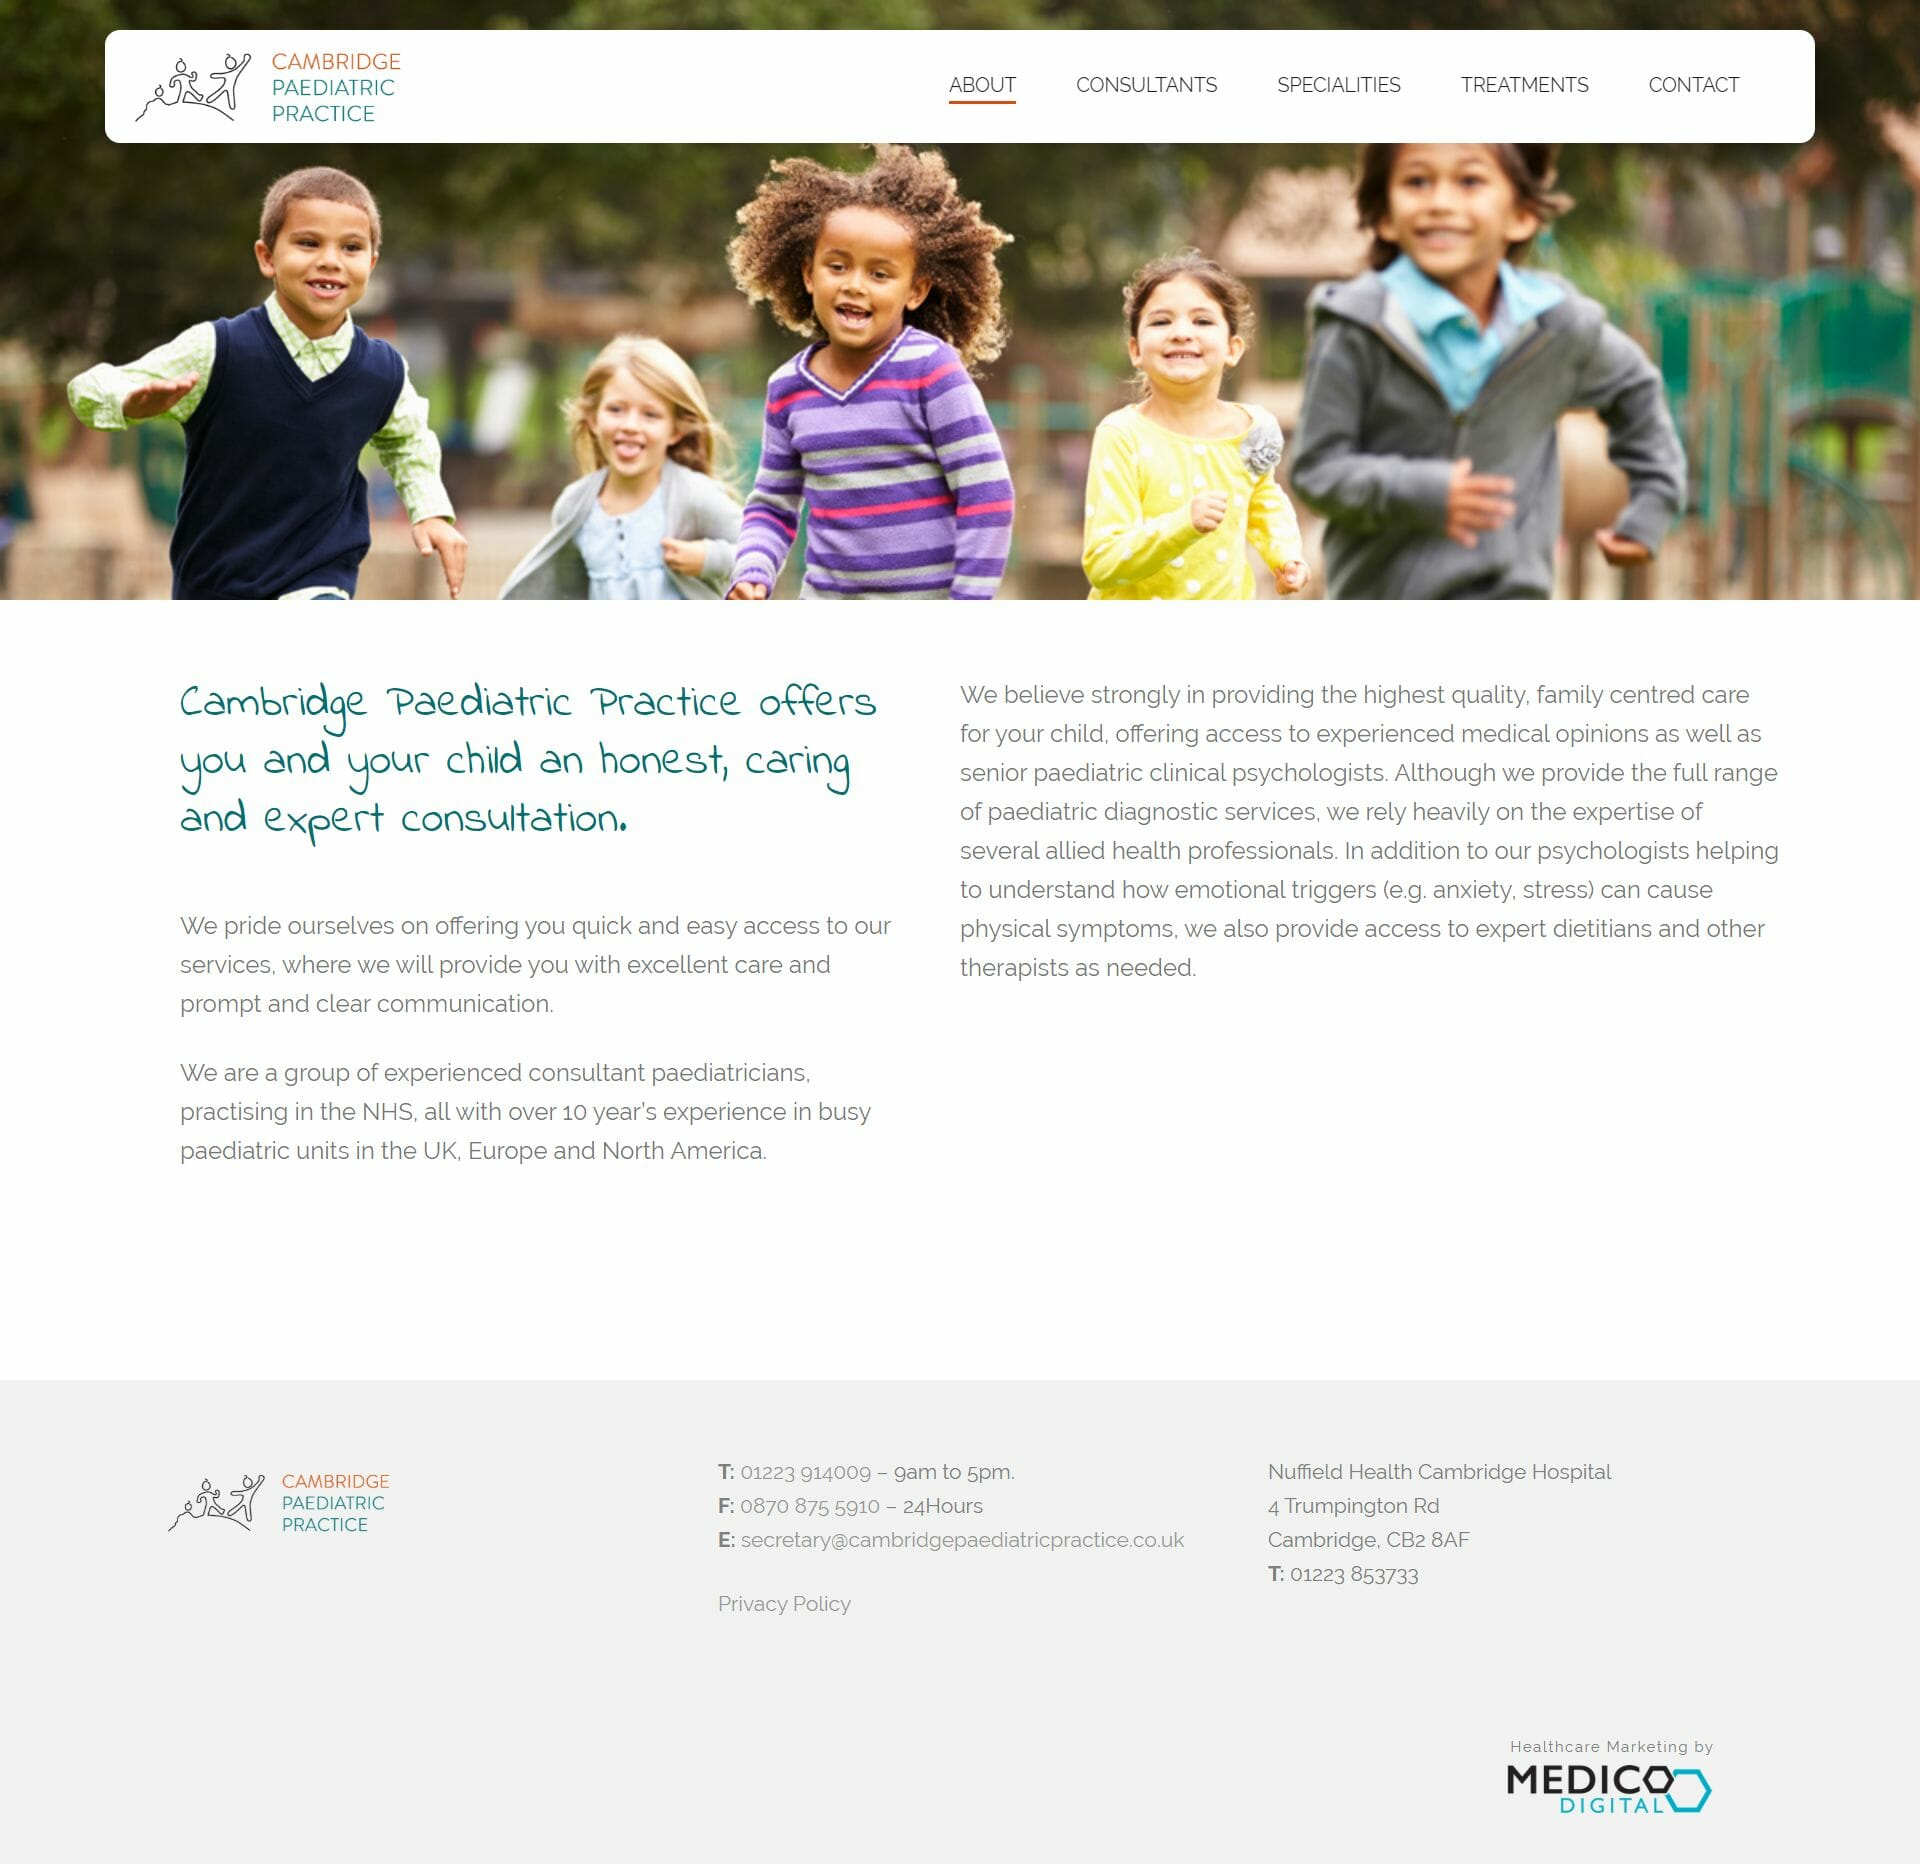 cambridgepaediatricpractice.co.uk